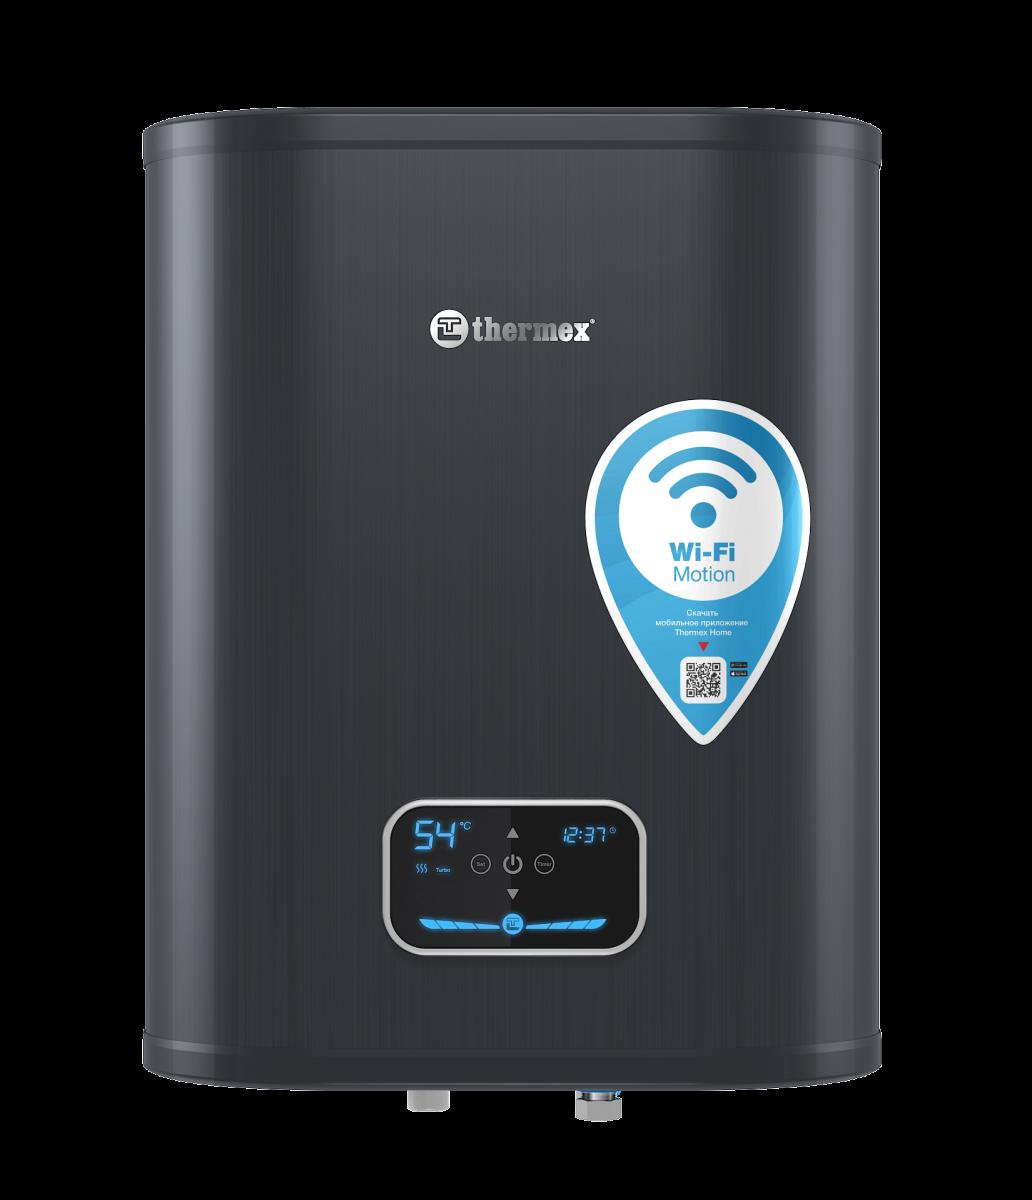 Водонагреватель THERMEX ID 30 V (pro) Wi-Fi